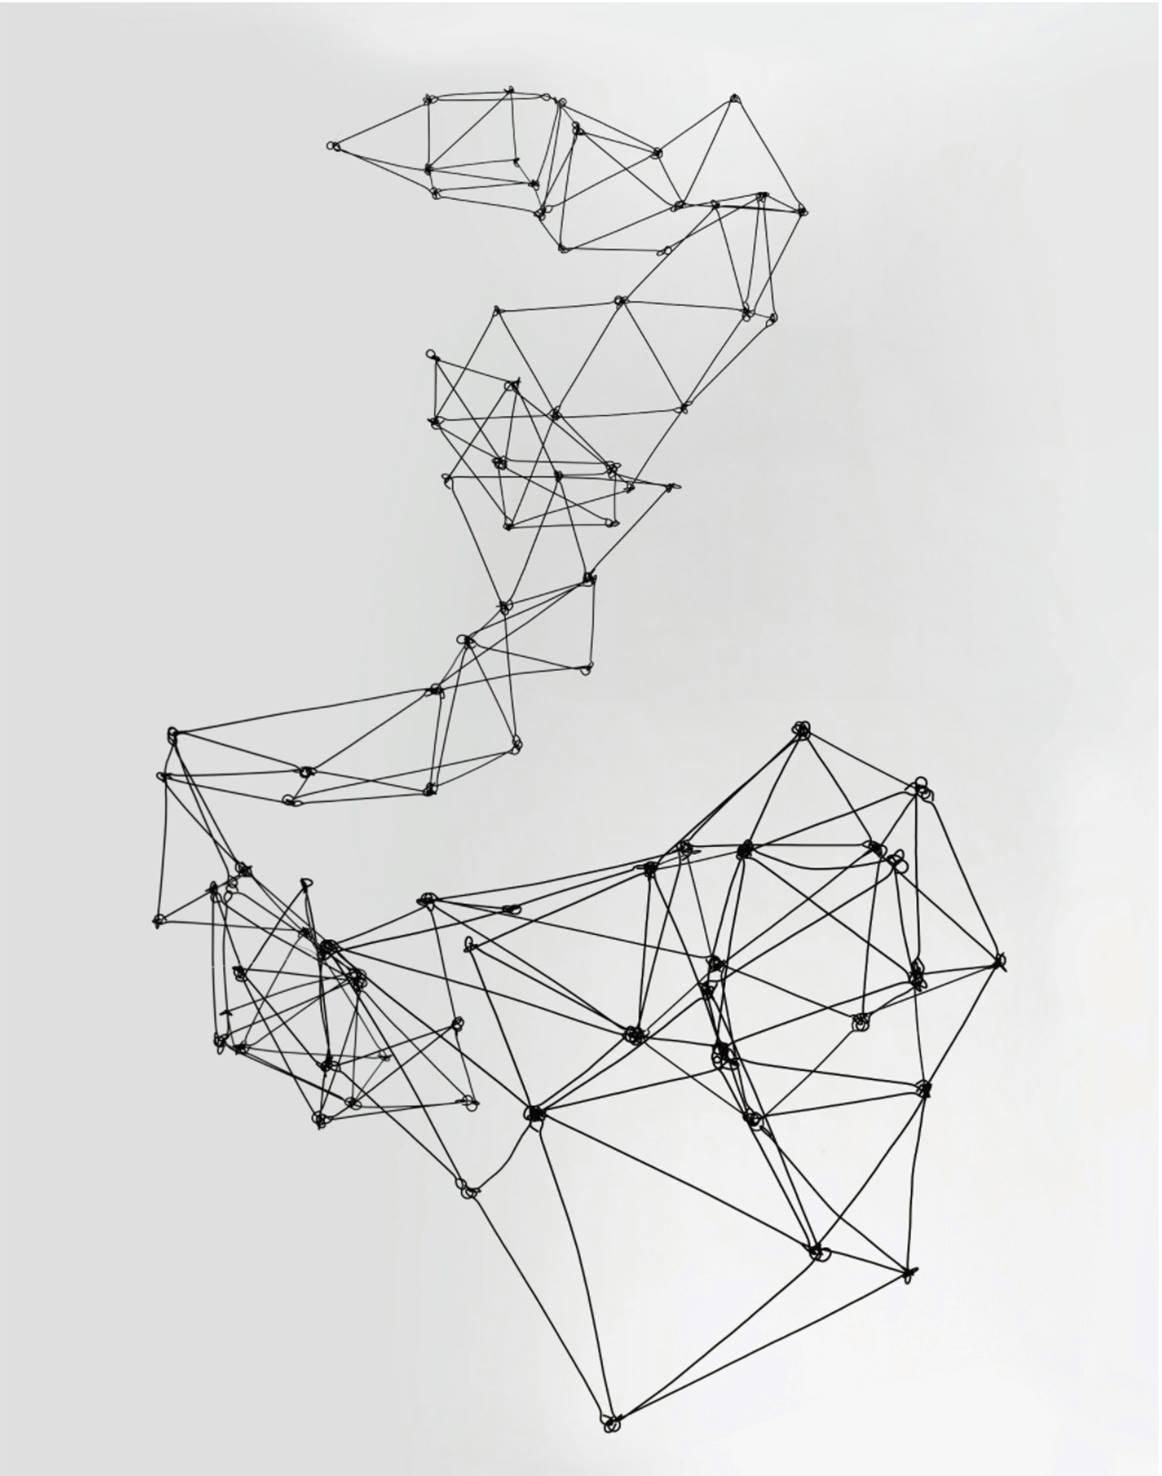 Gego. Columna Reticulárea. 1969. MoMA